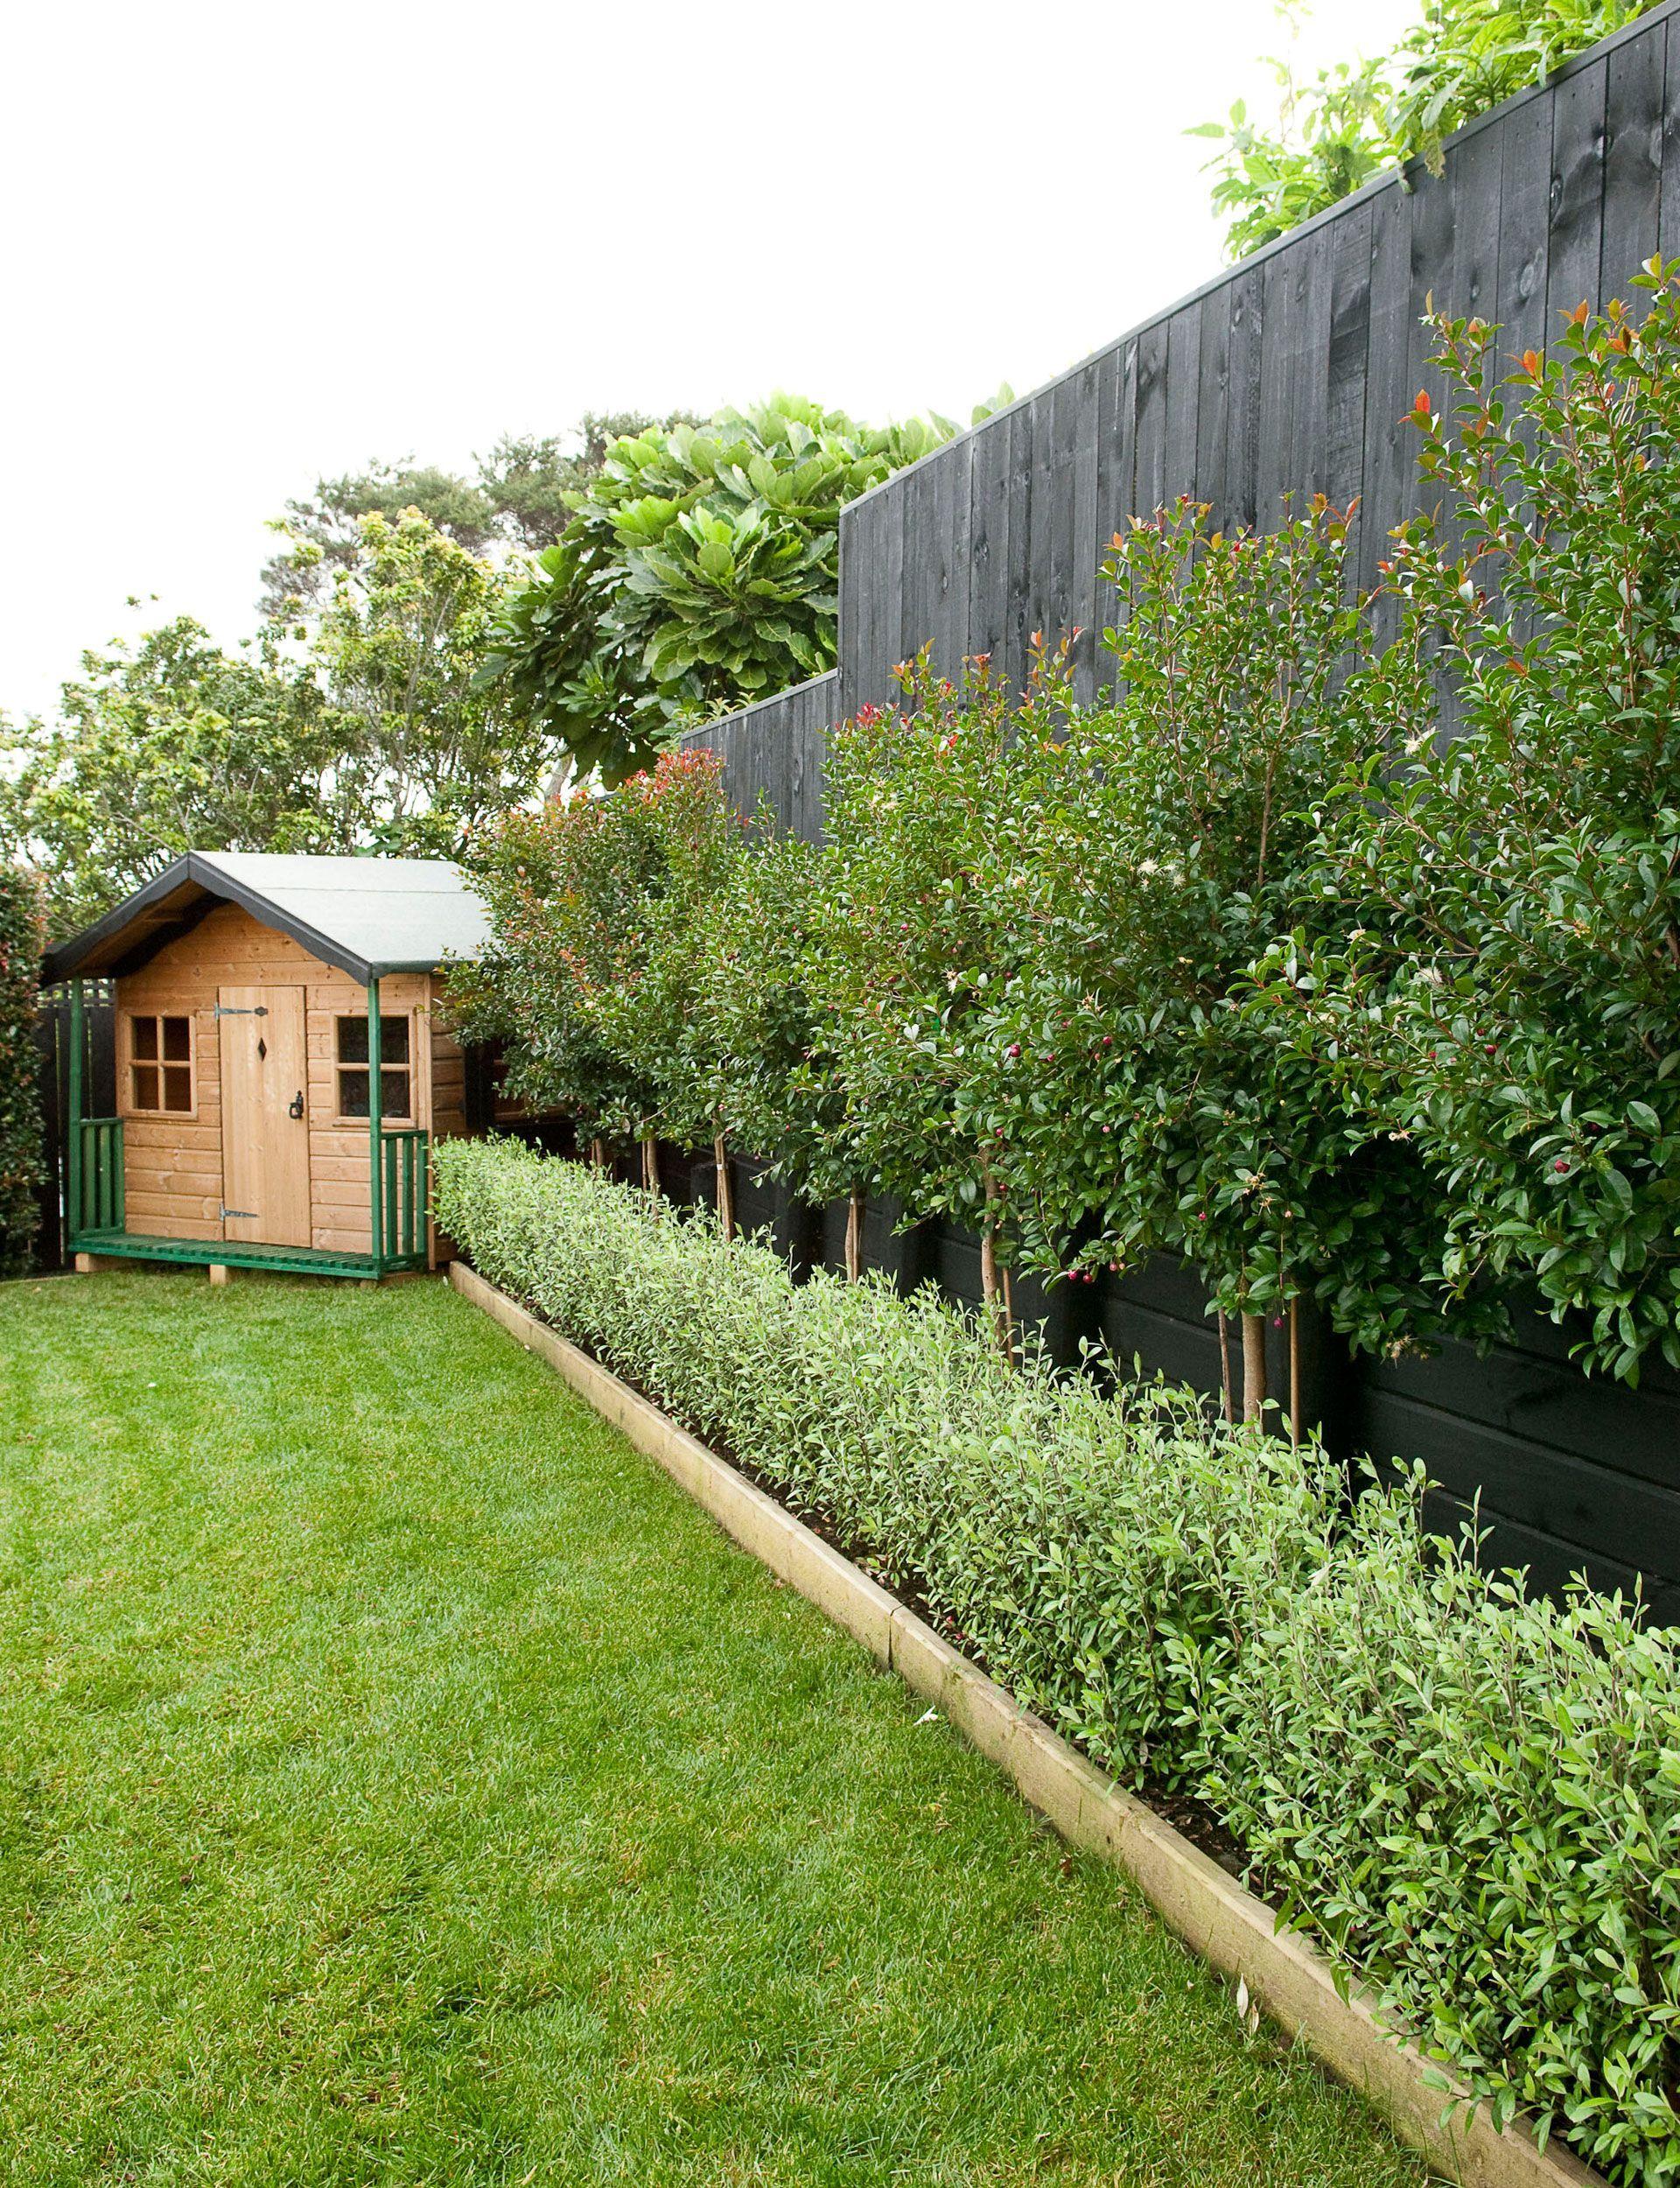 Horticulturalist and director of Smart Garden Ryan McQuerry lets us